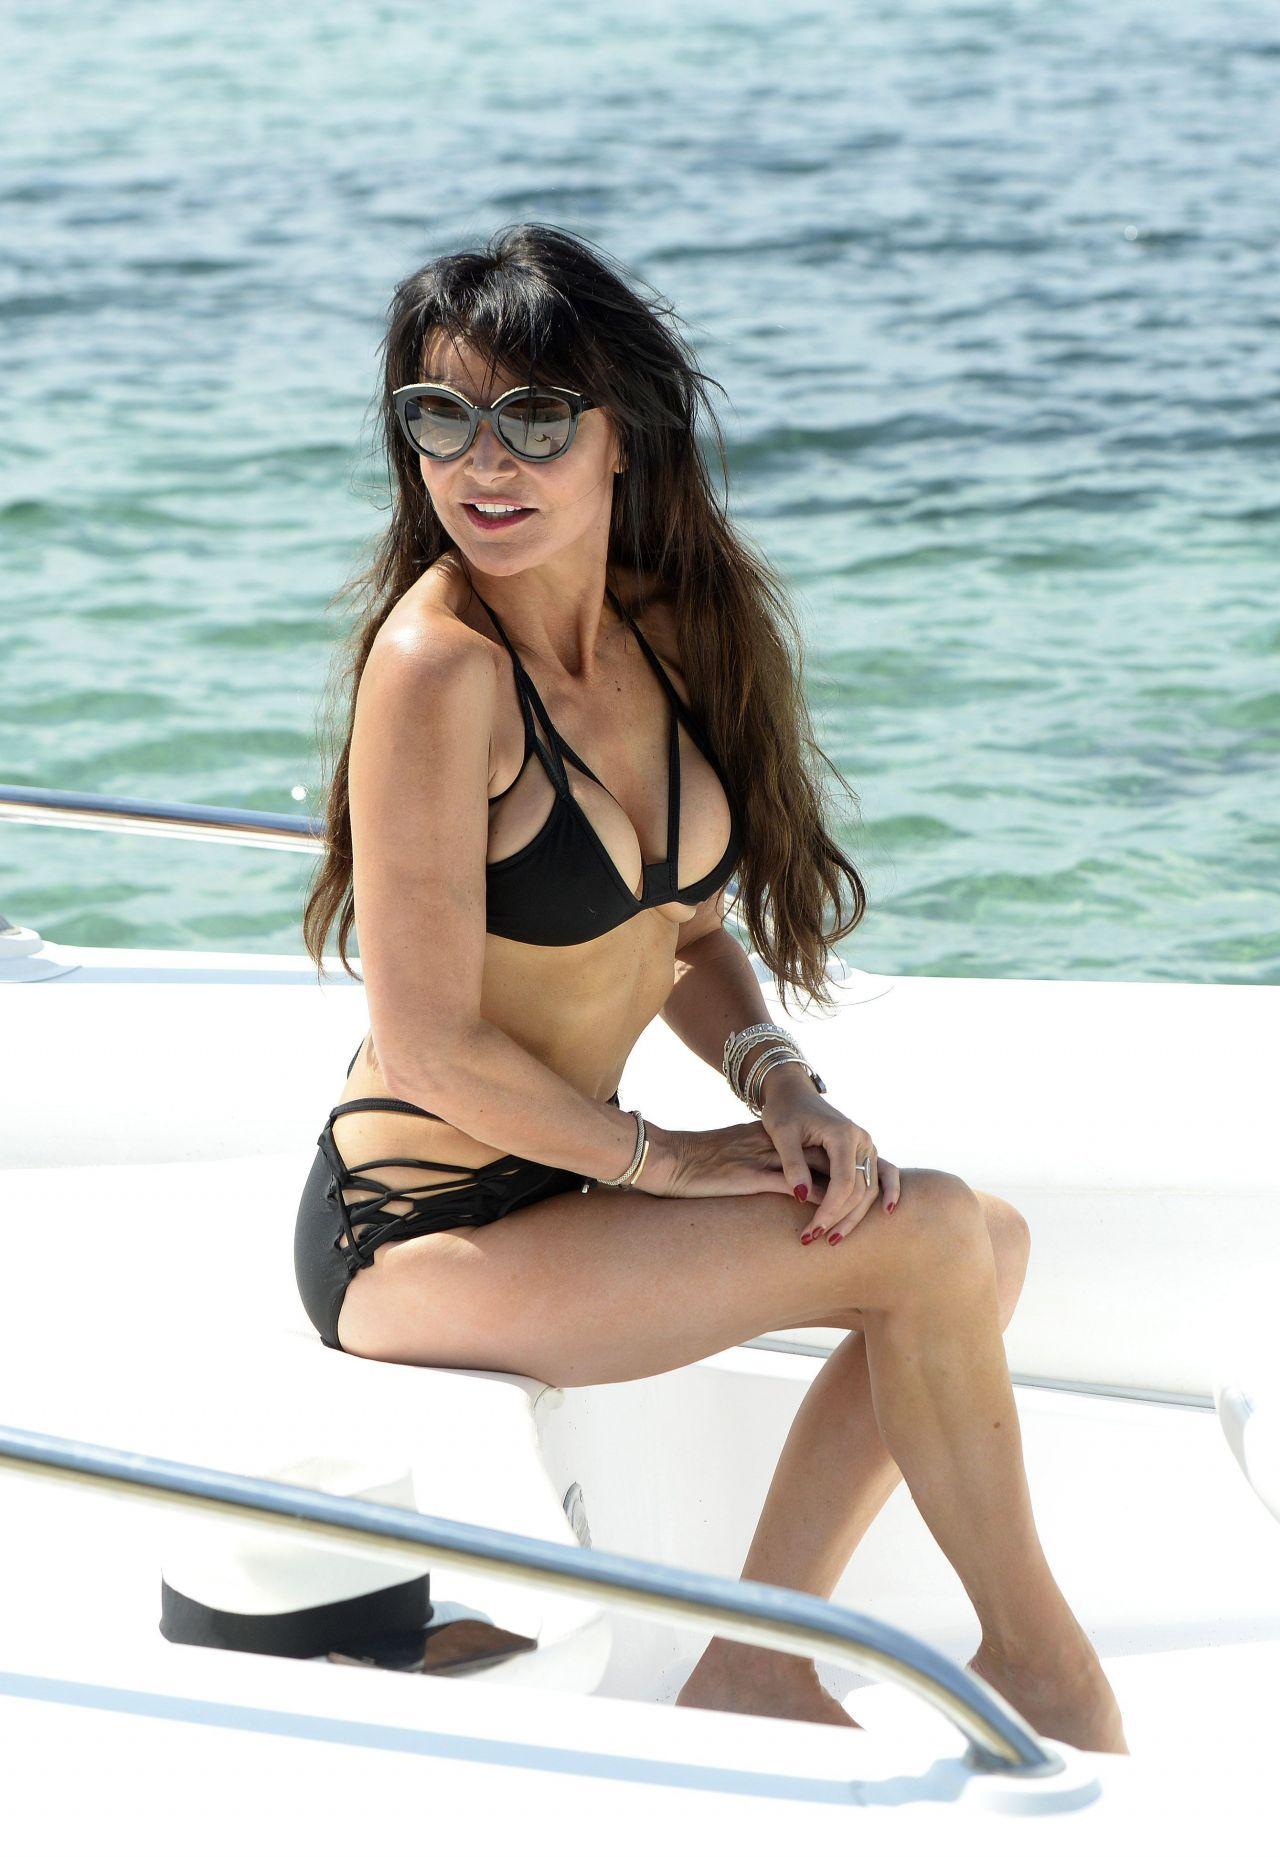 Bikini Lizzie Cundy nude (54 photos), Sexy, Hot, Selfie, legs 2017